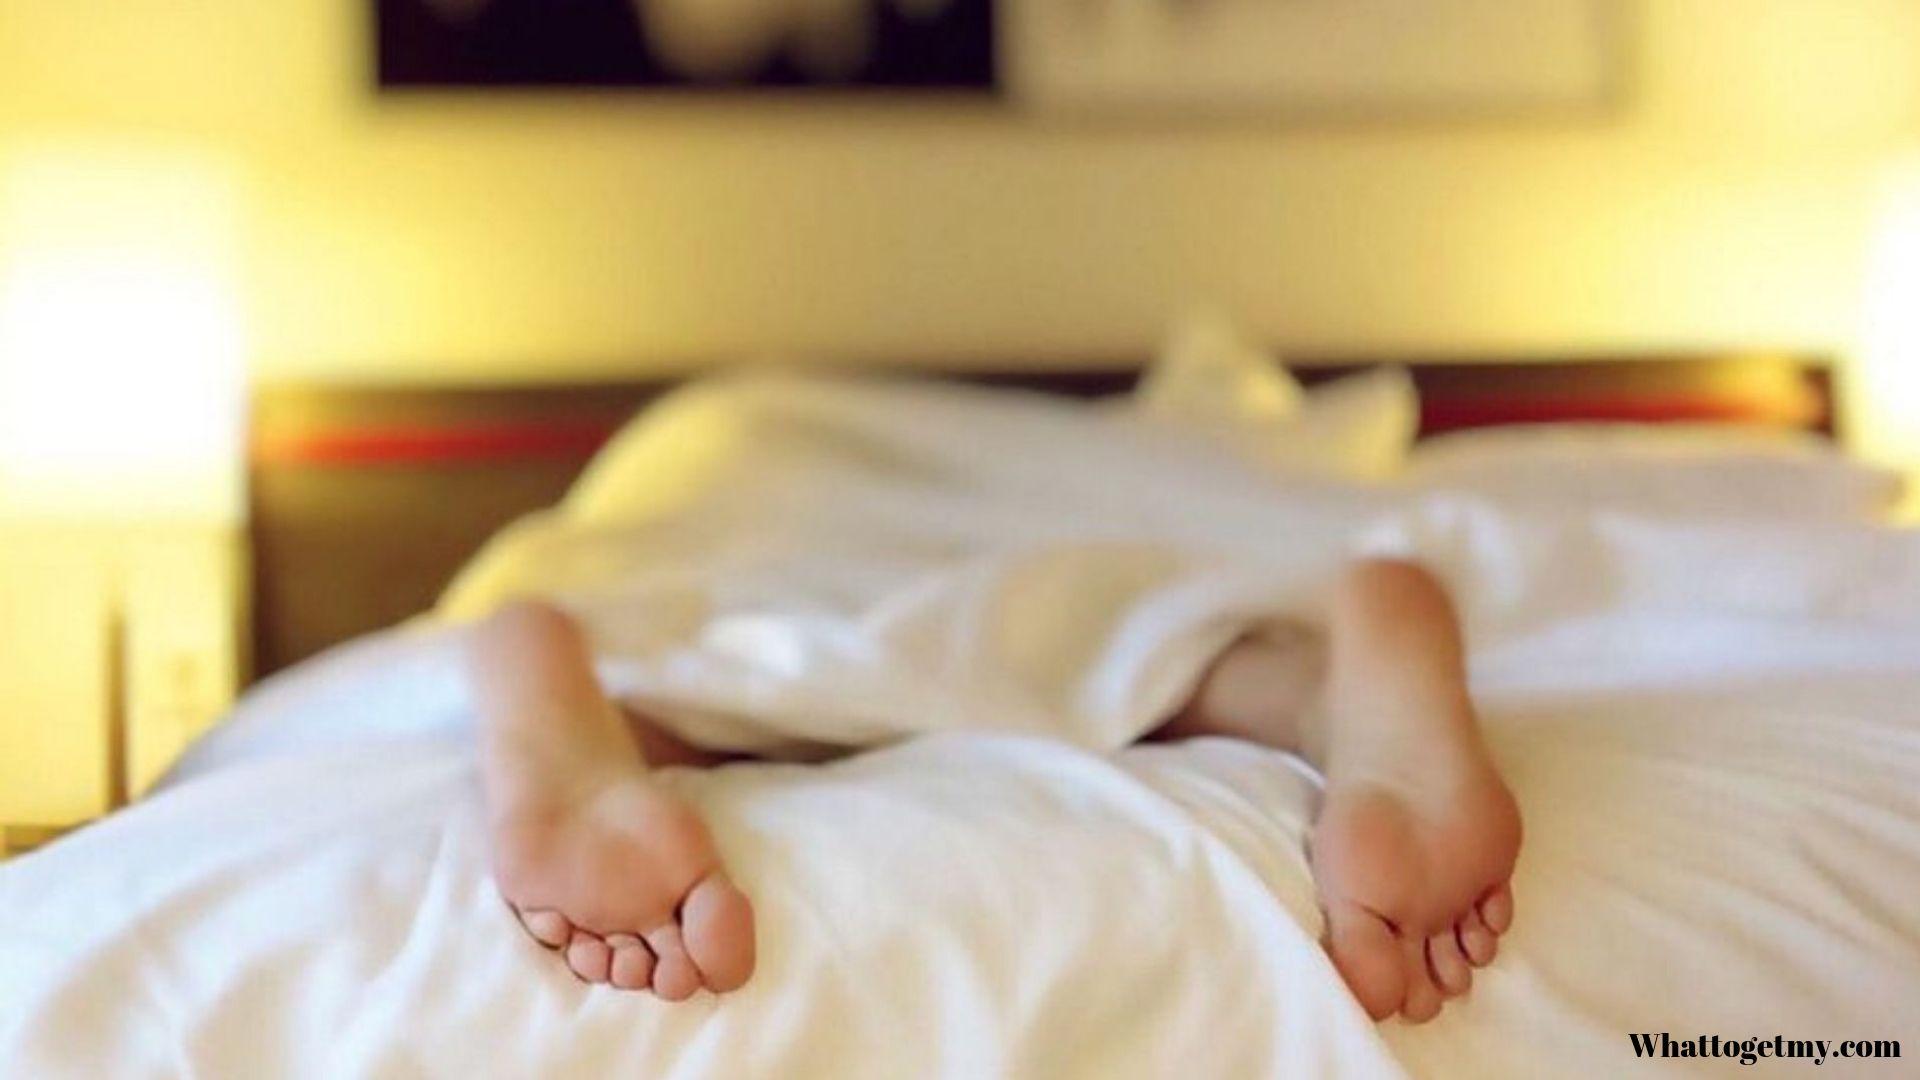 How People Effortless Fall Asleep